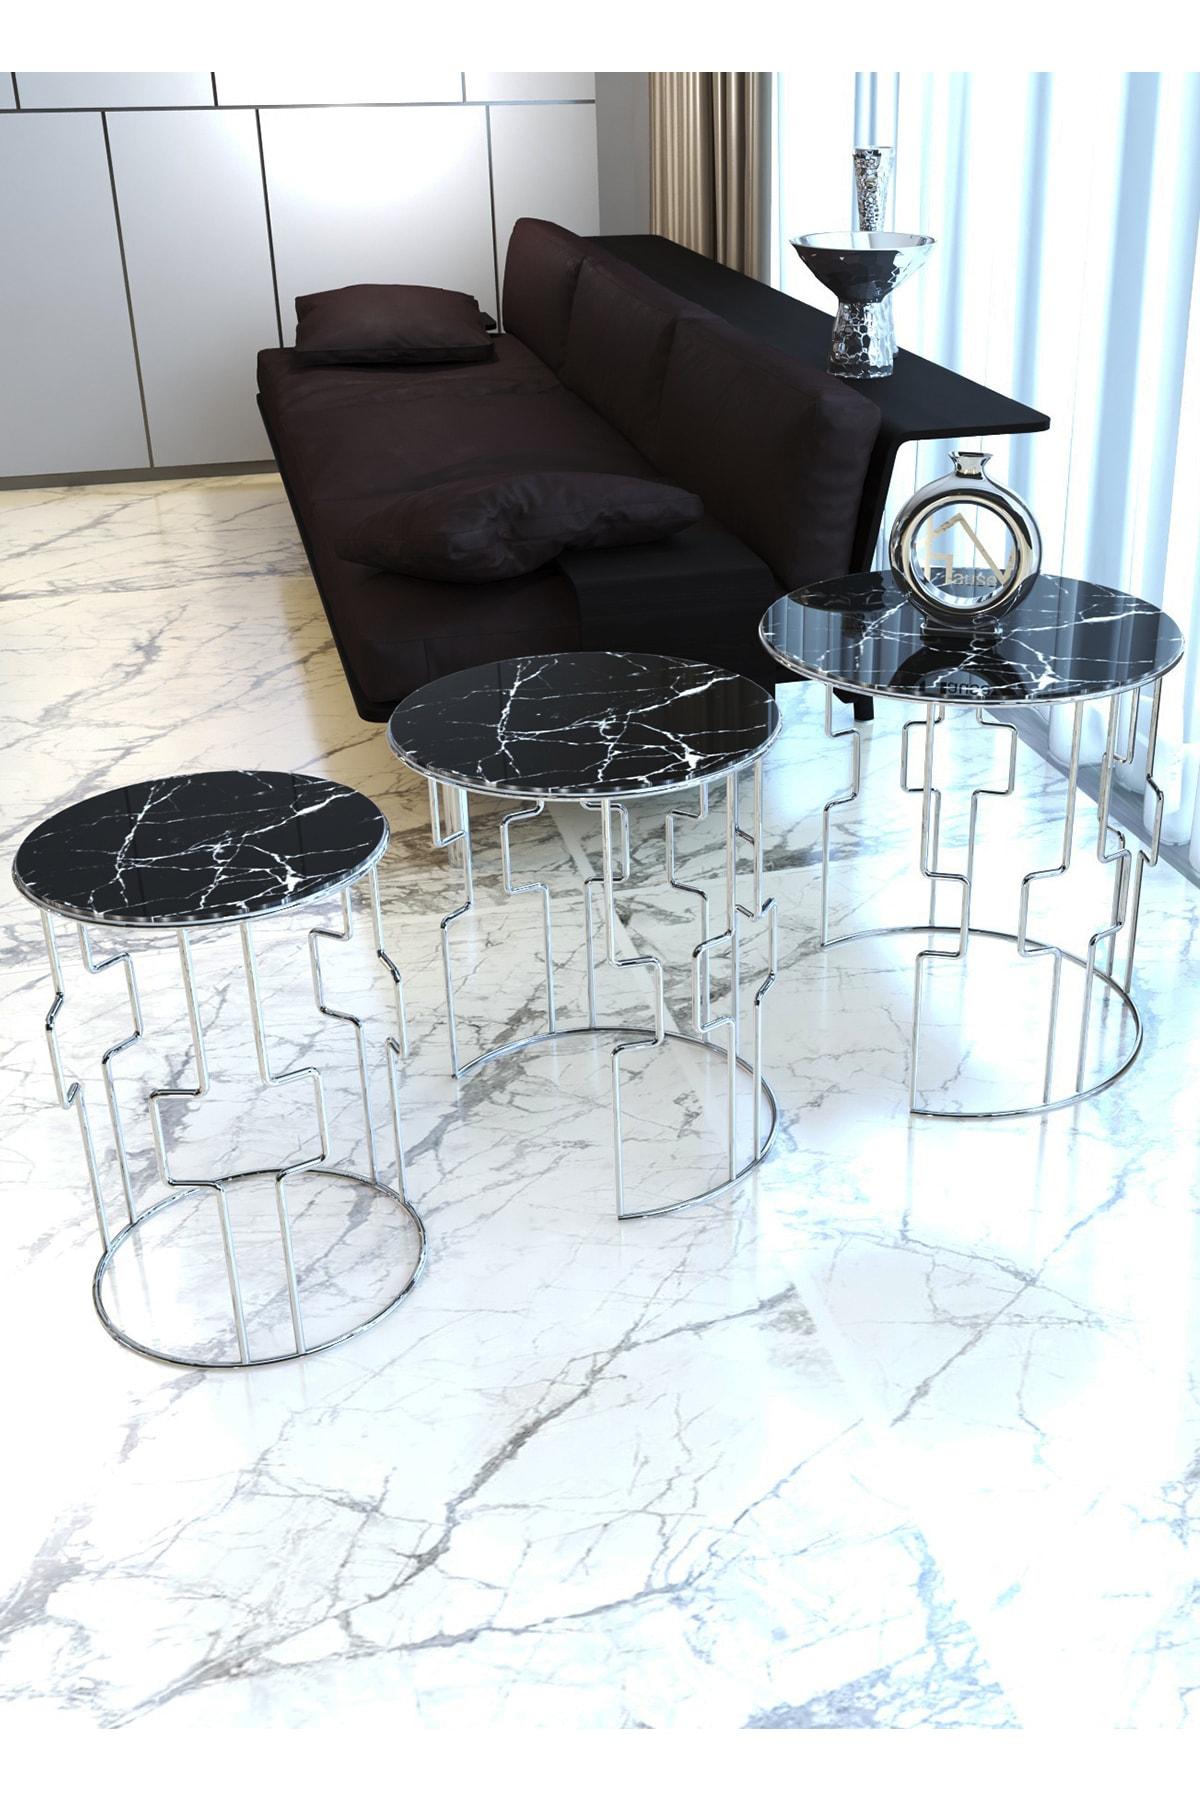 HAUSEV Siyah Işıltı Kare Model Gümüş Metal Zigon Sehpa